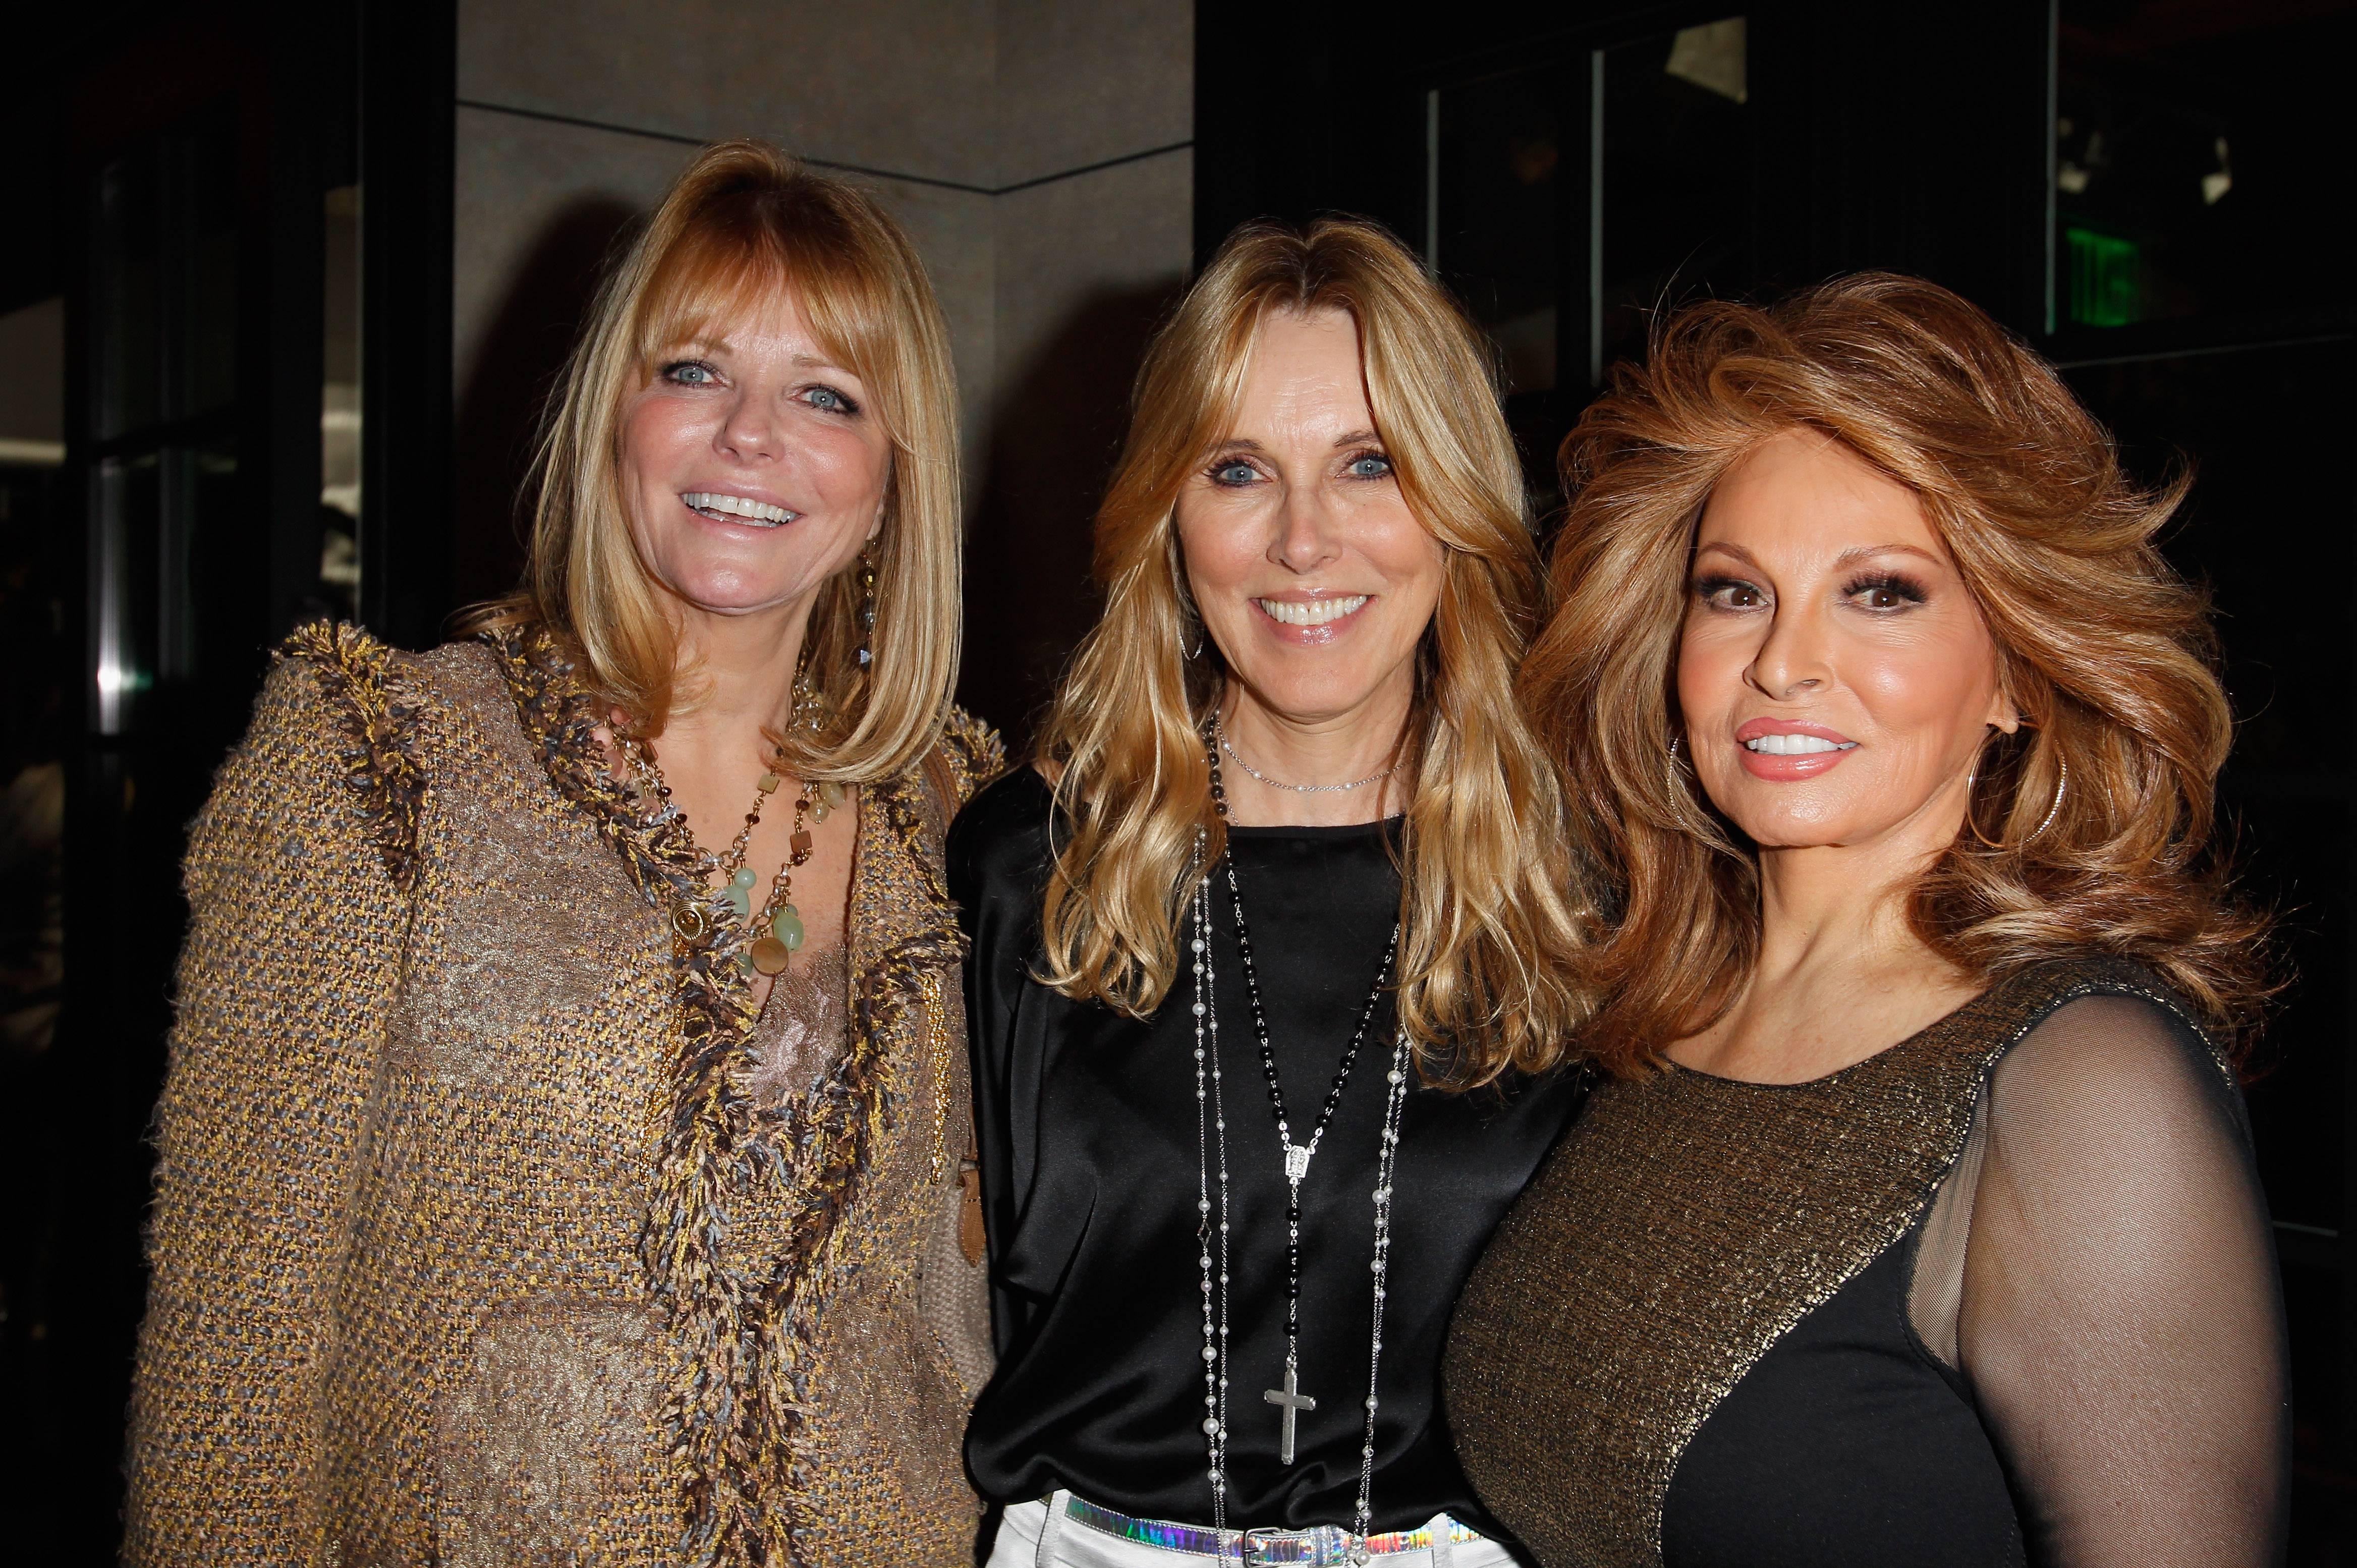 Cheryl Tiegs, Alana Stewart and Raquel Welch